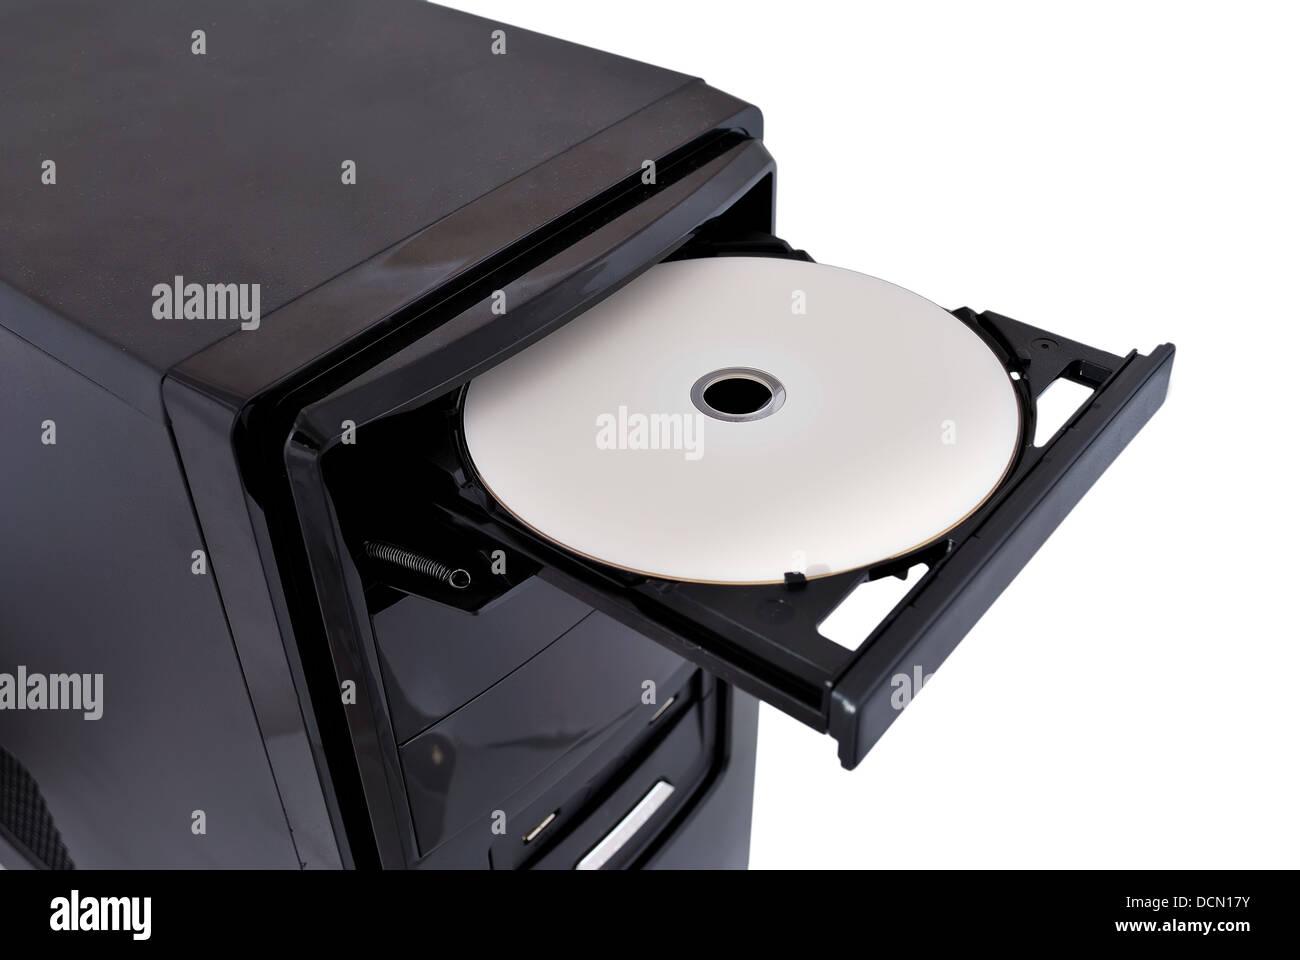 open dvd rom - Stock Image